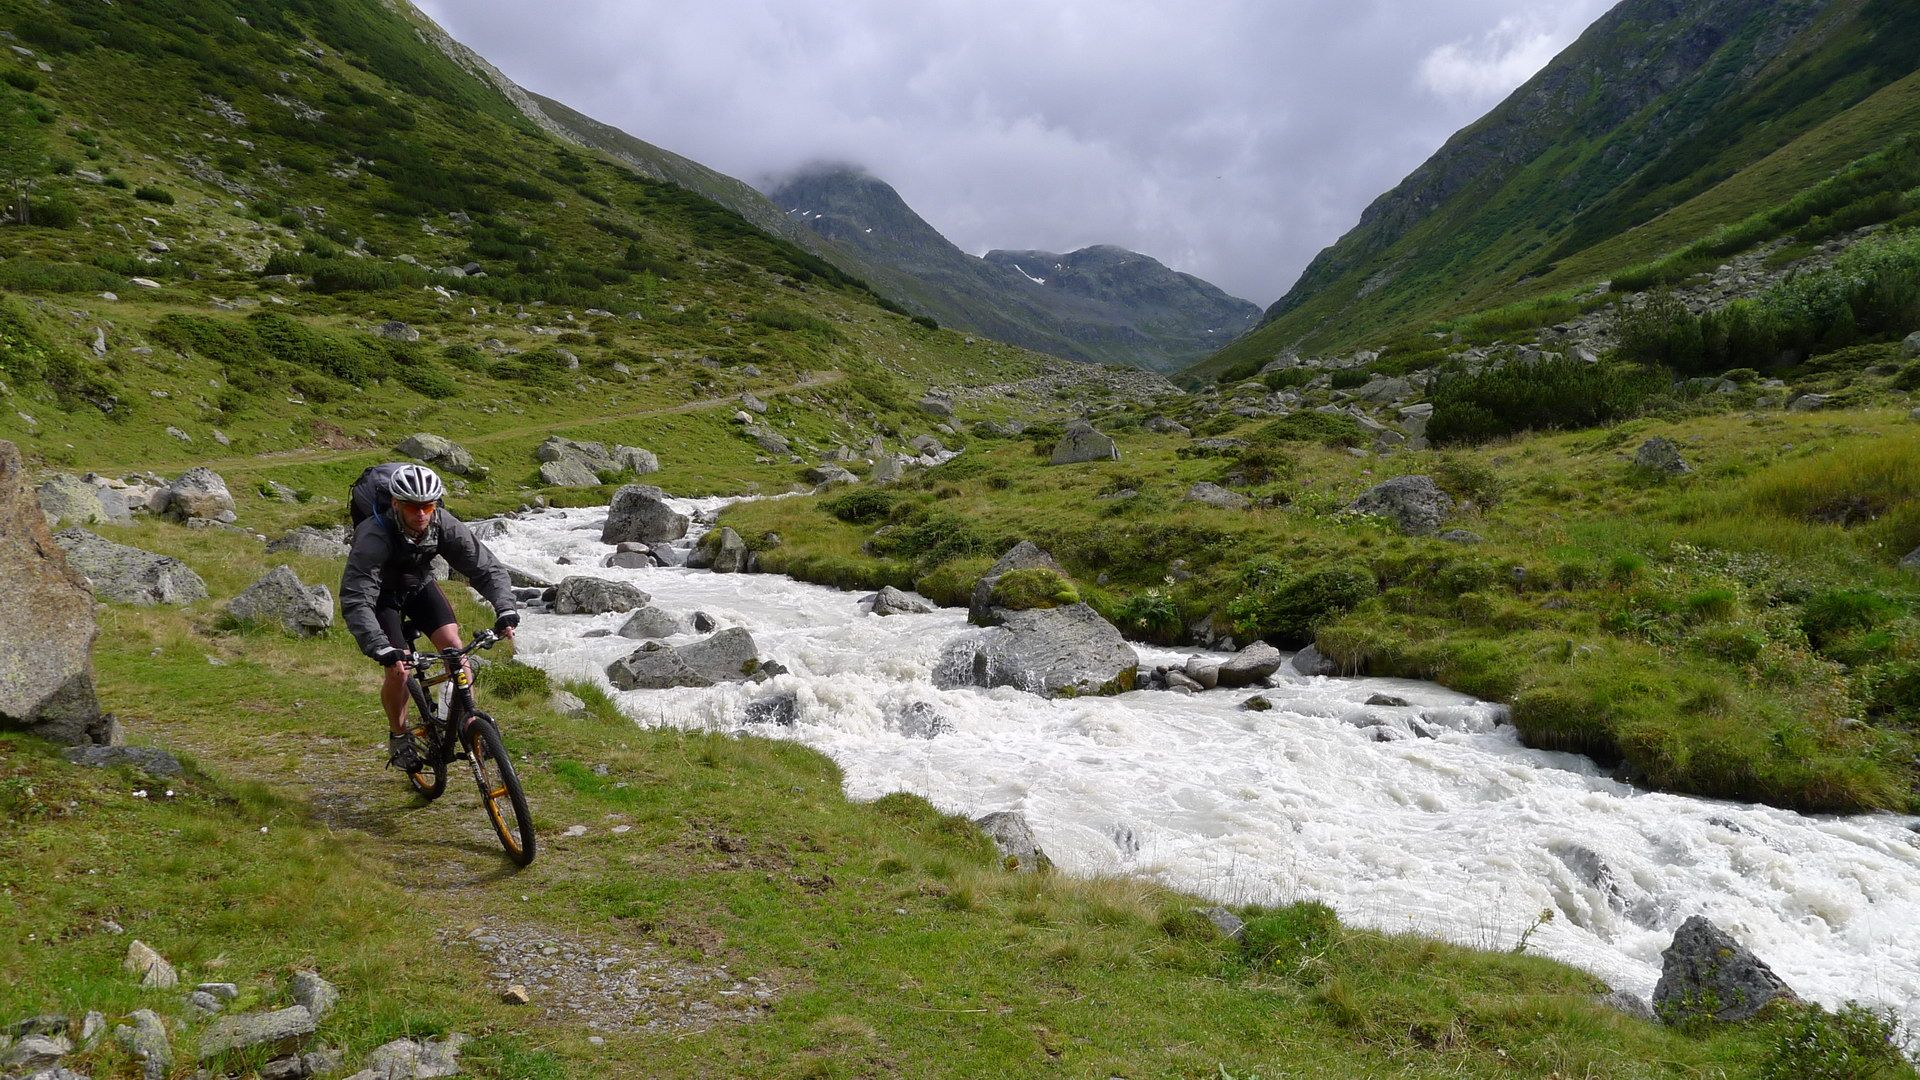 Mountain biking in Switzerland Mountain biking, Hd